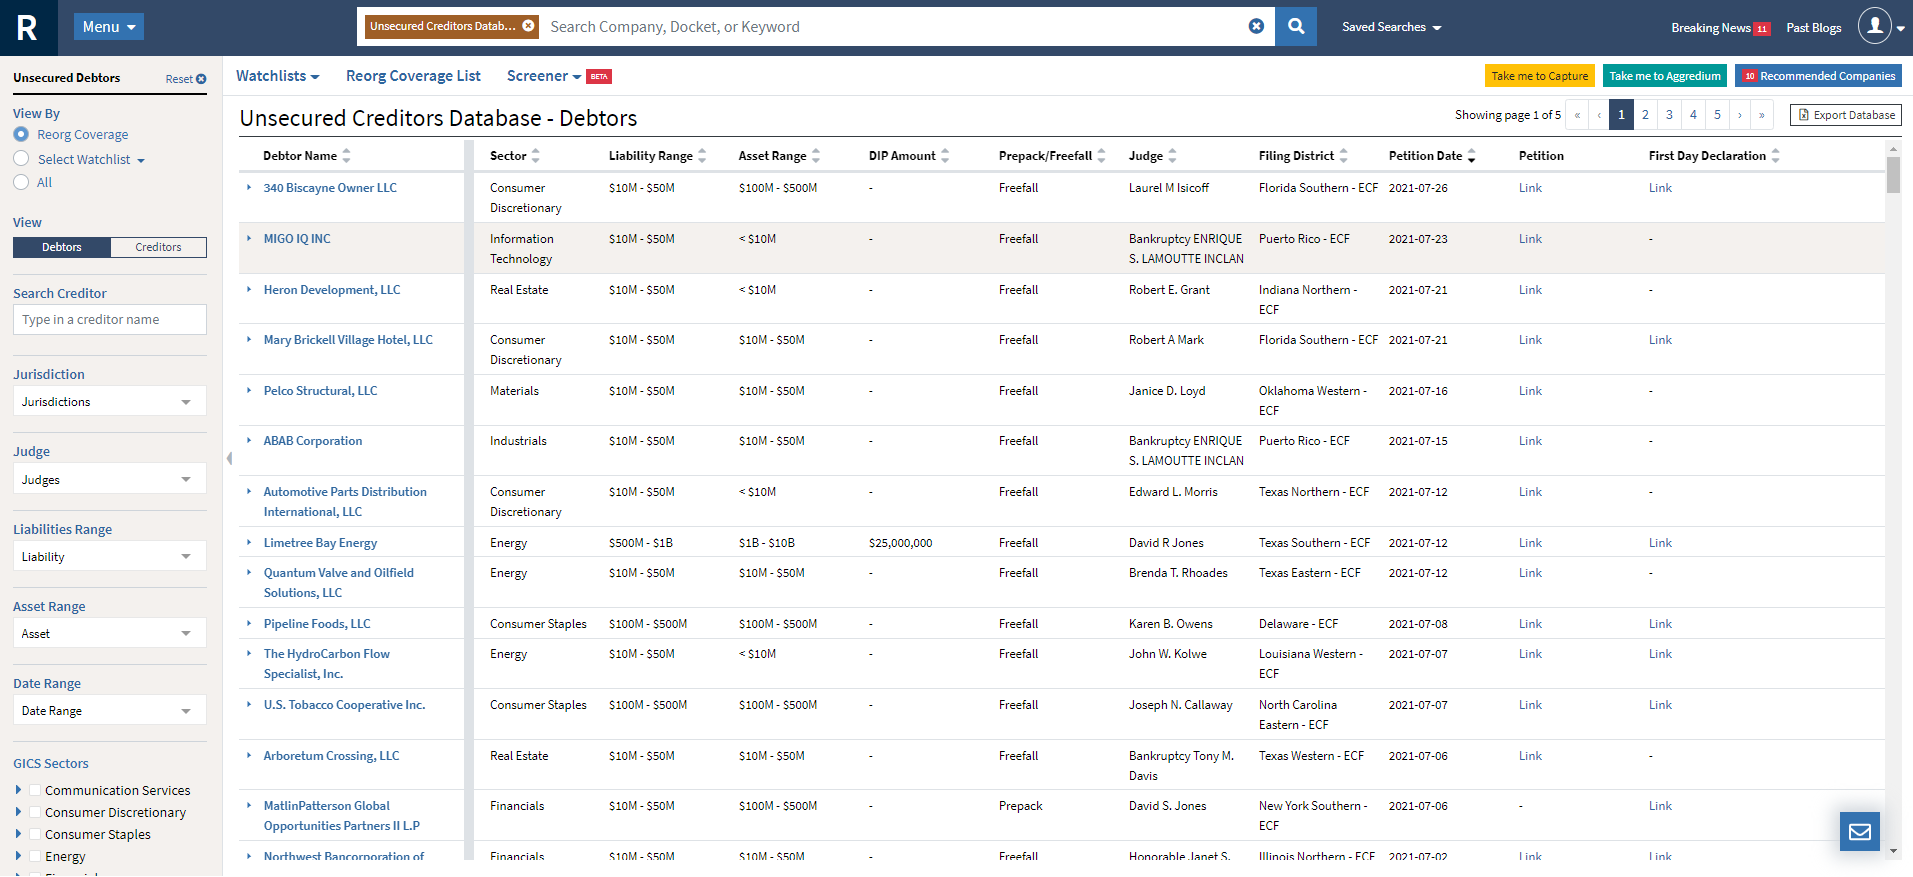 unsecured creditors database screenshot